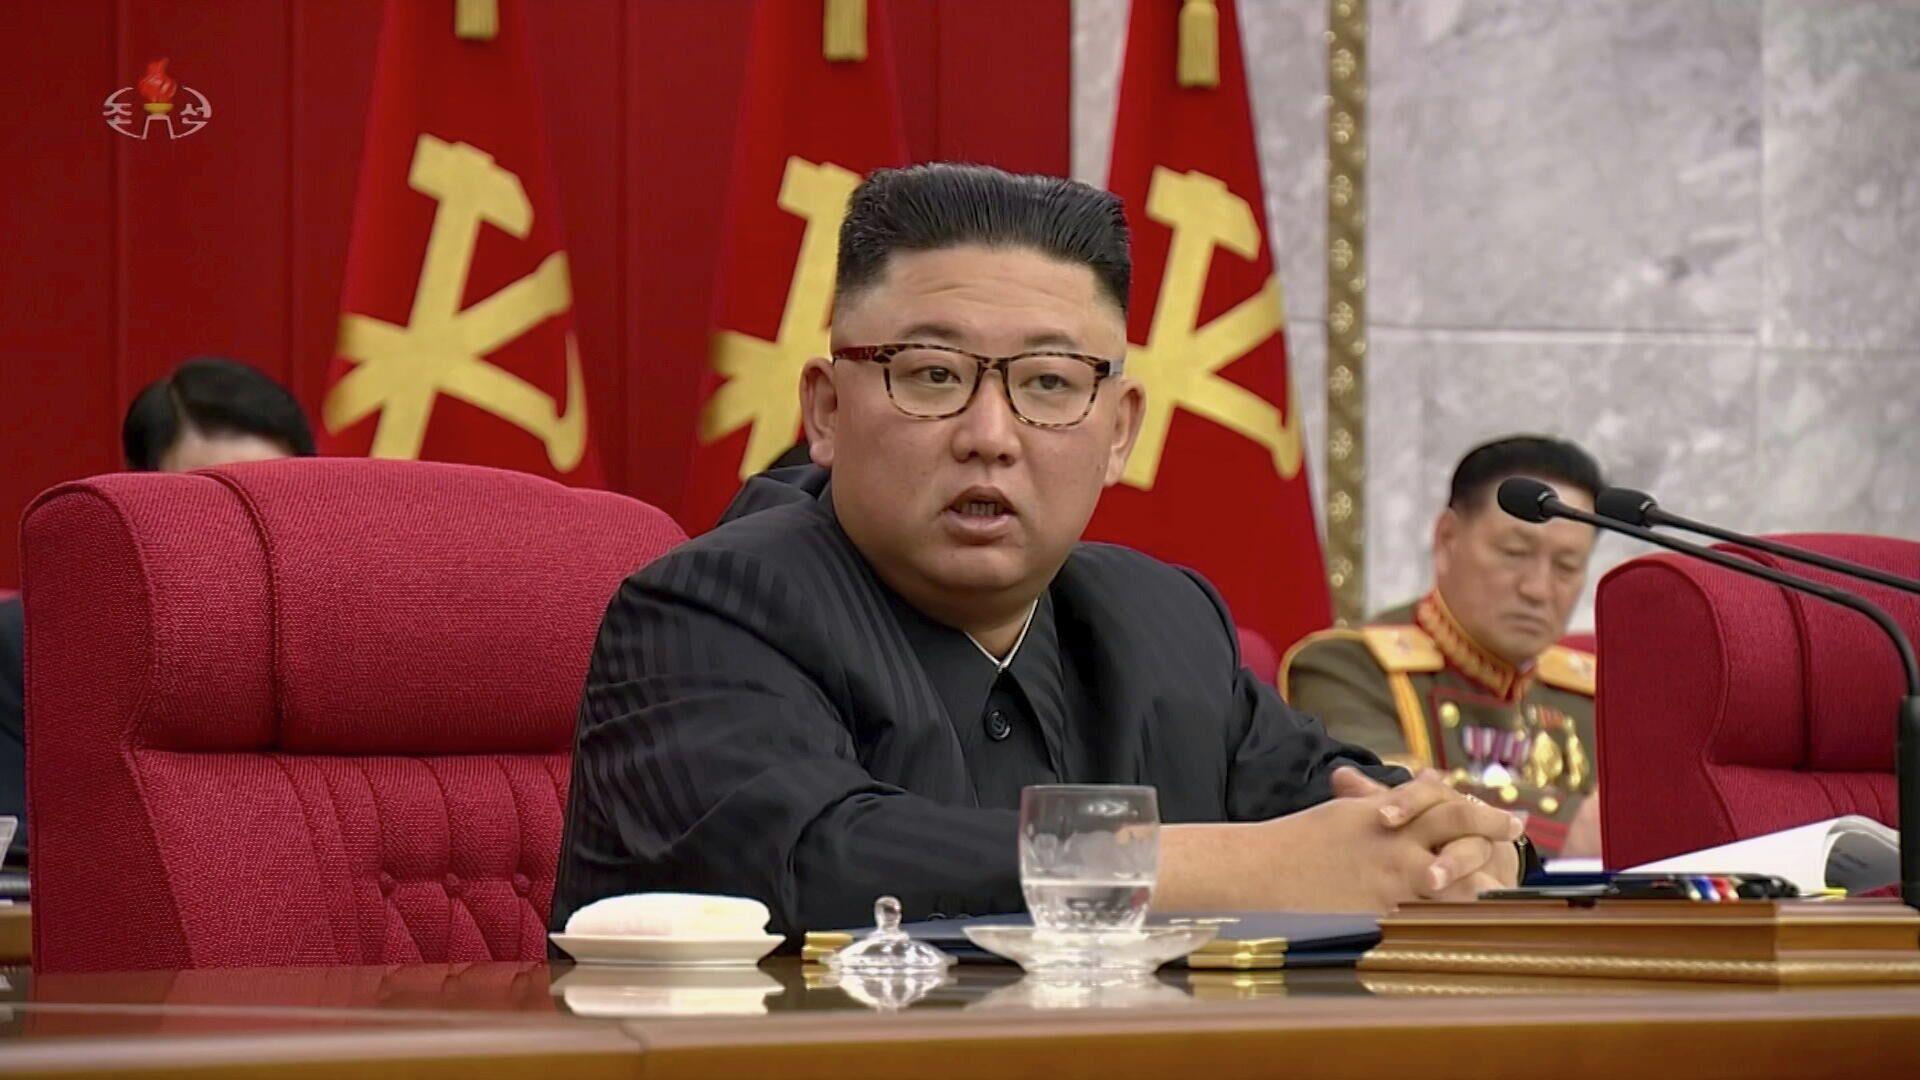 Kim Jong-un, líder de Corea del Norte - Sputnik Mundo, 1920, 29.06.2021